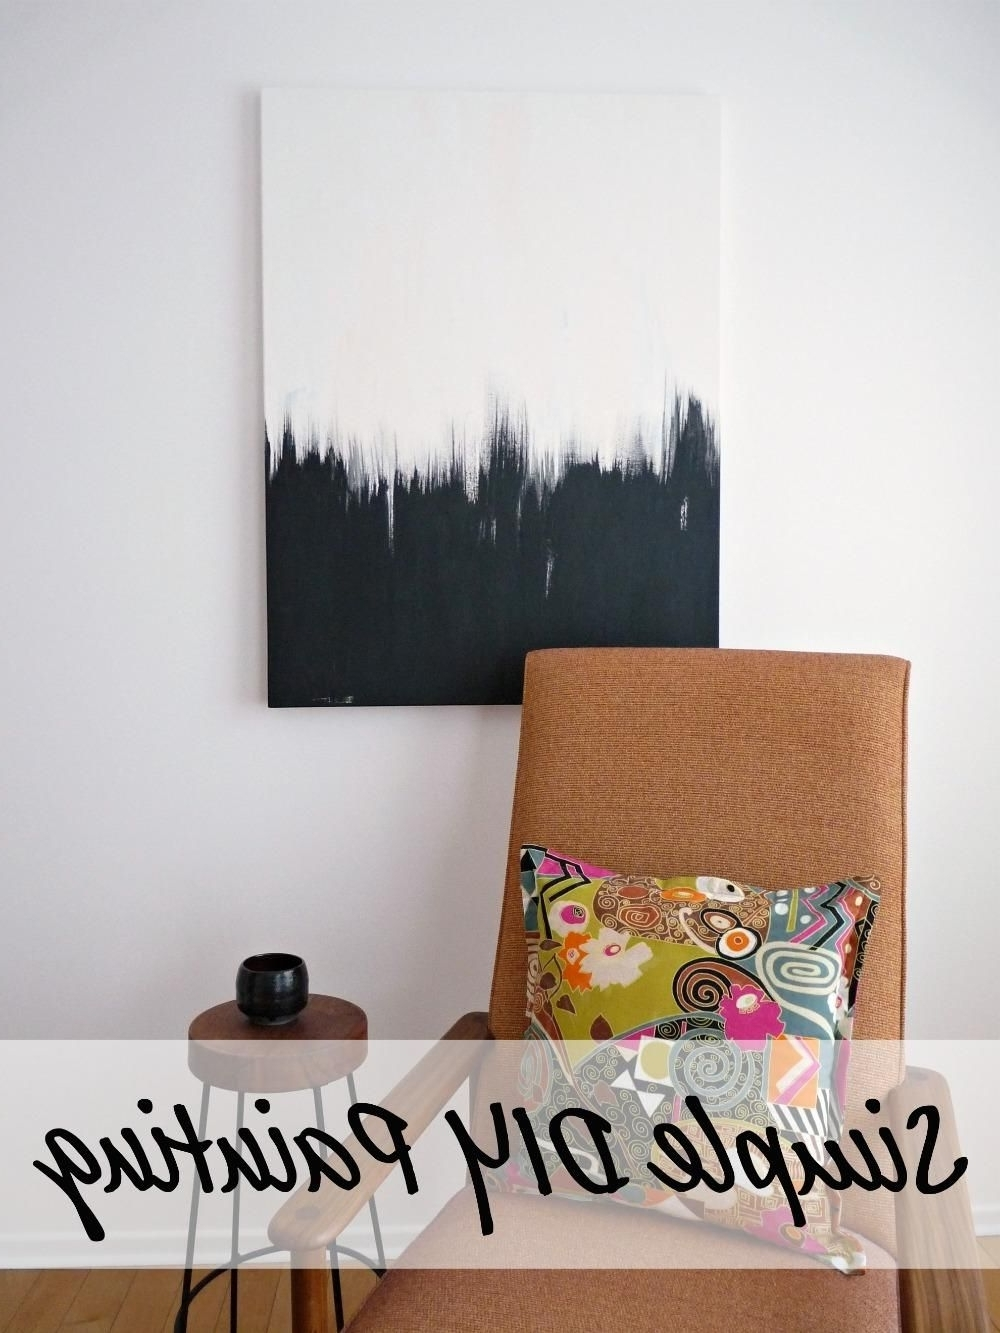 Diy Wall Art: Simple But Striking Diy Black And White Wall Art Regarding Most Recent Diy Wall Art (View 5 of 15)